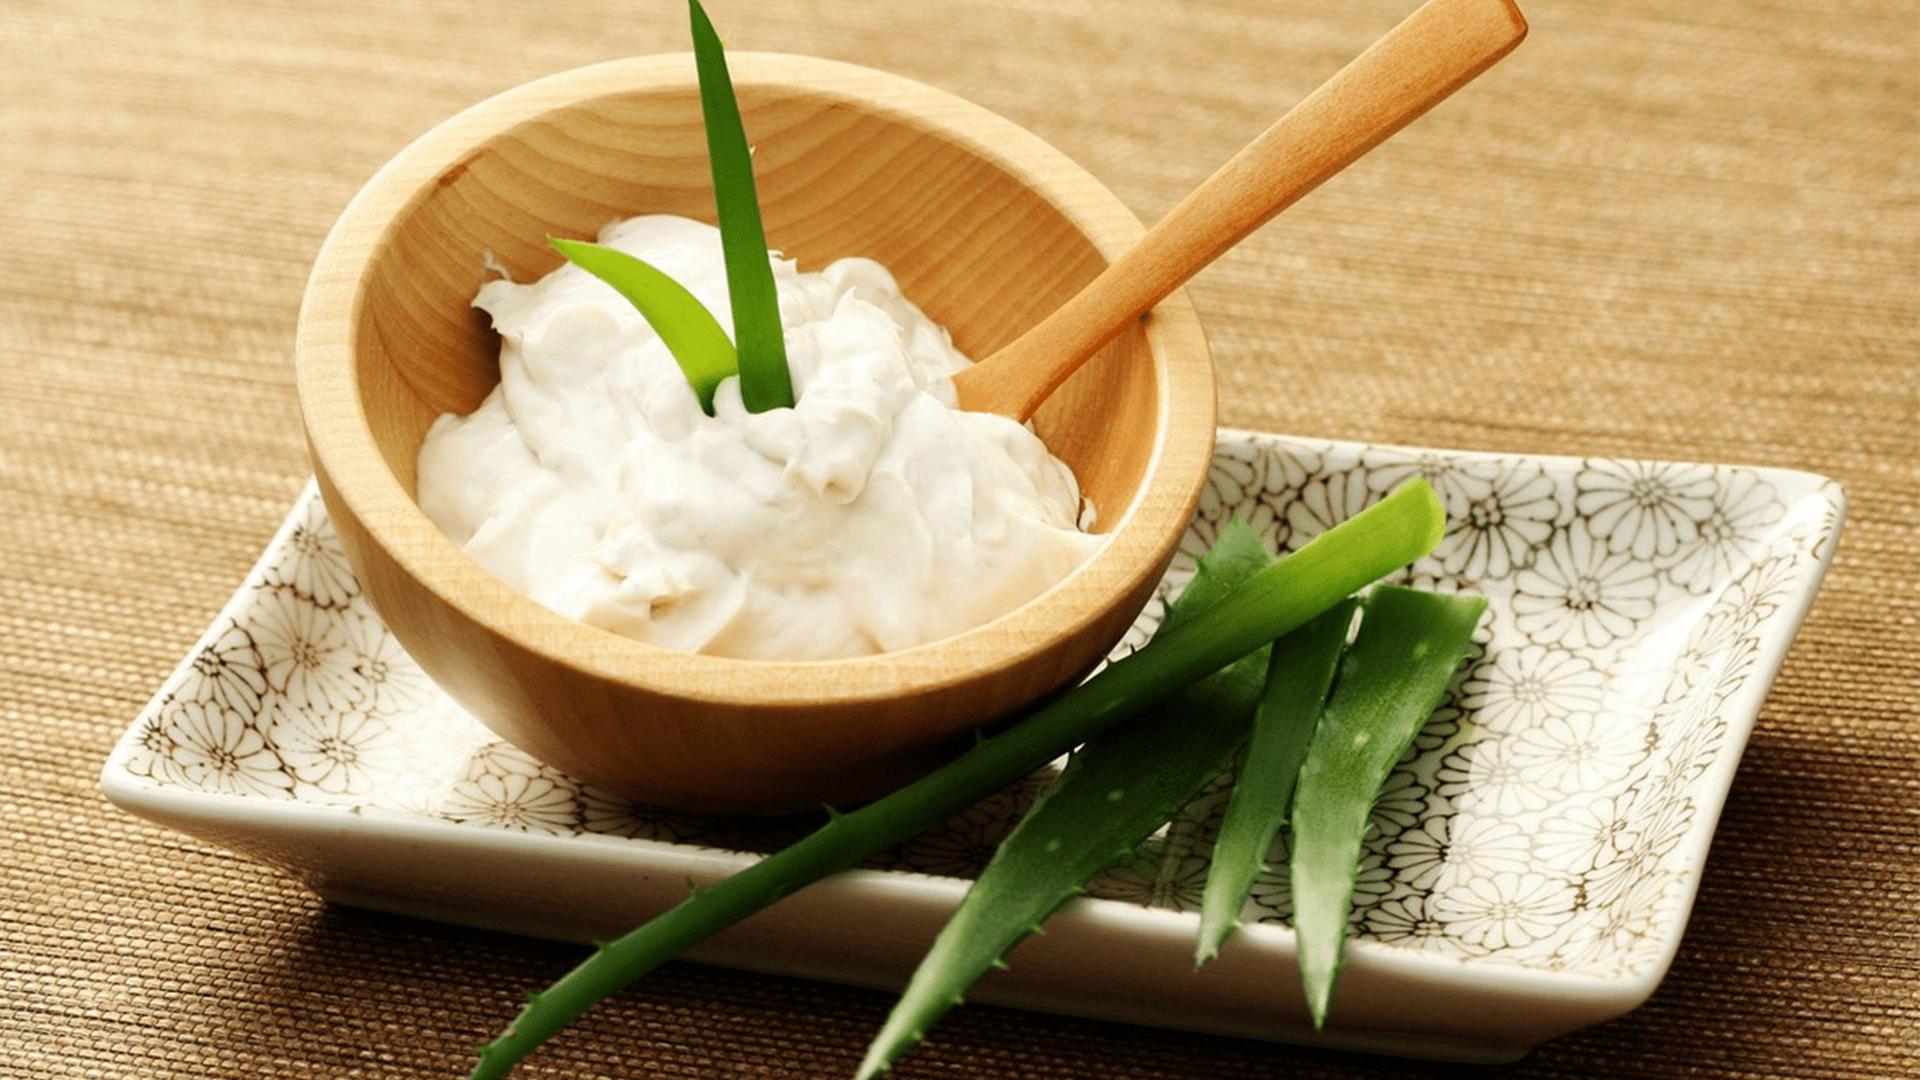 kokosovoe-maslo-i-aloe-vera